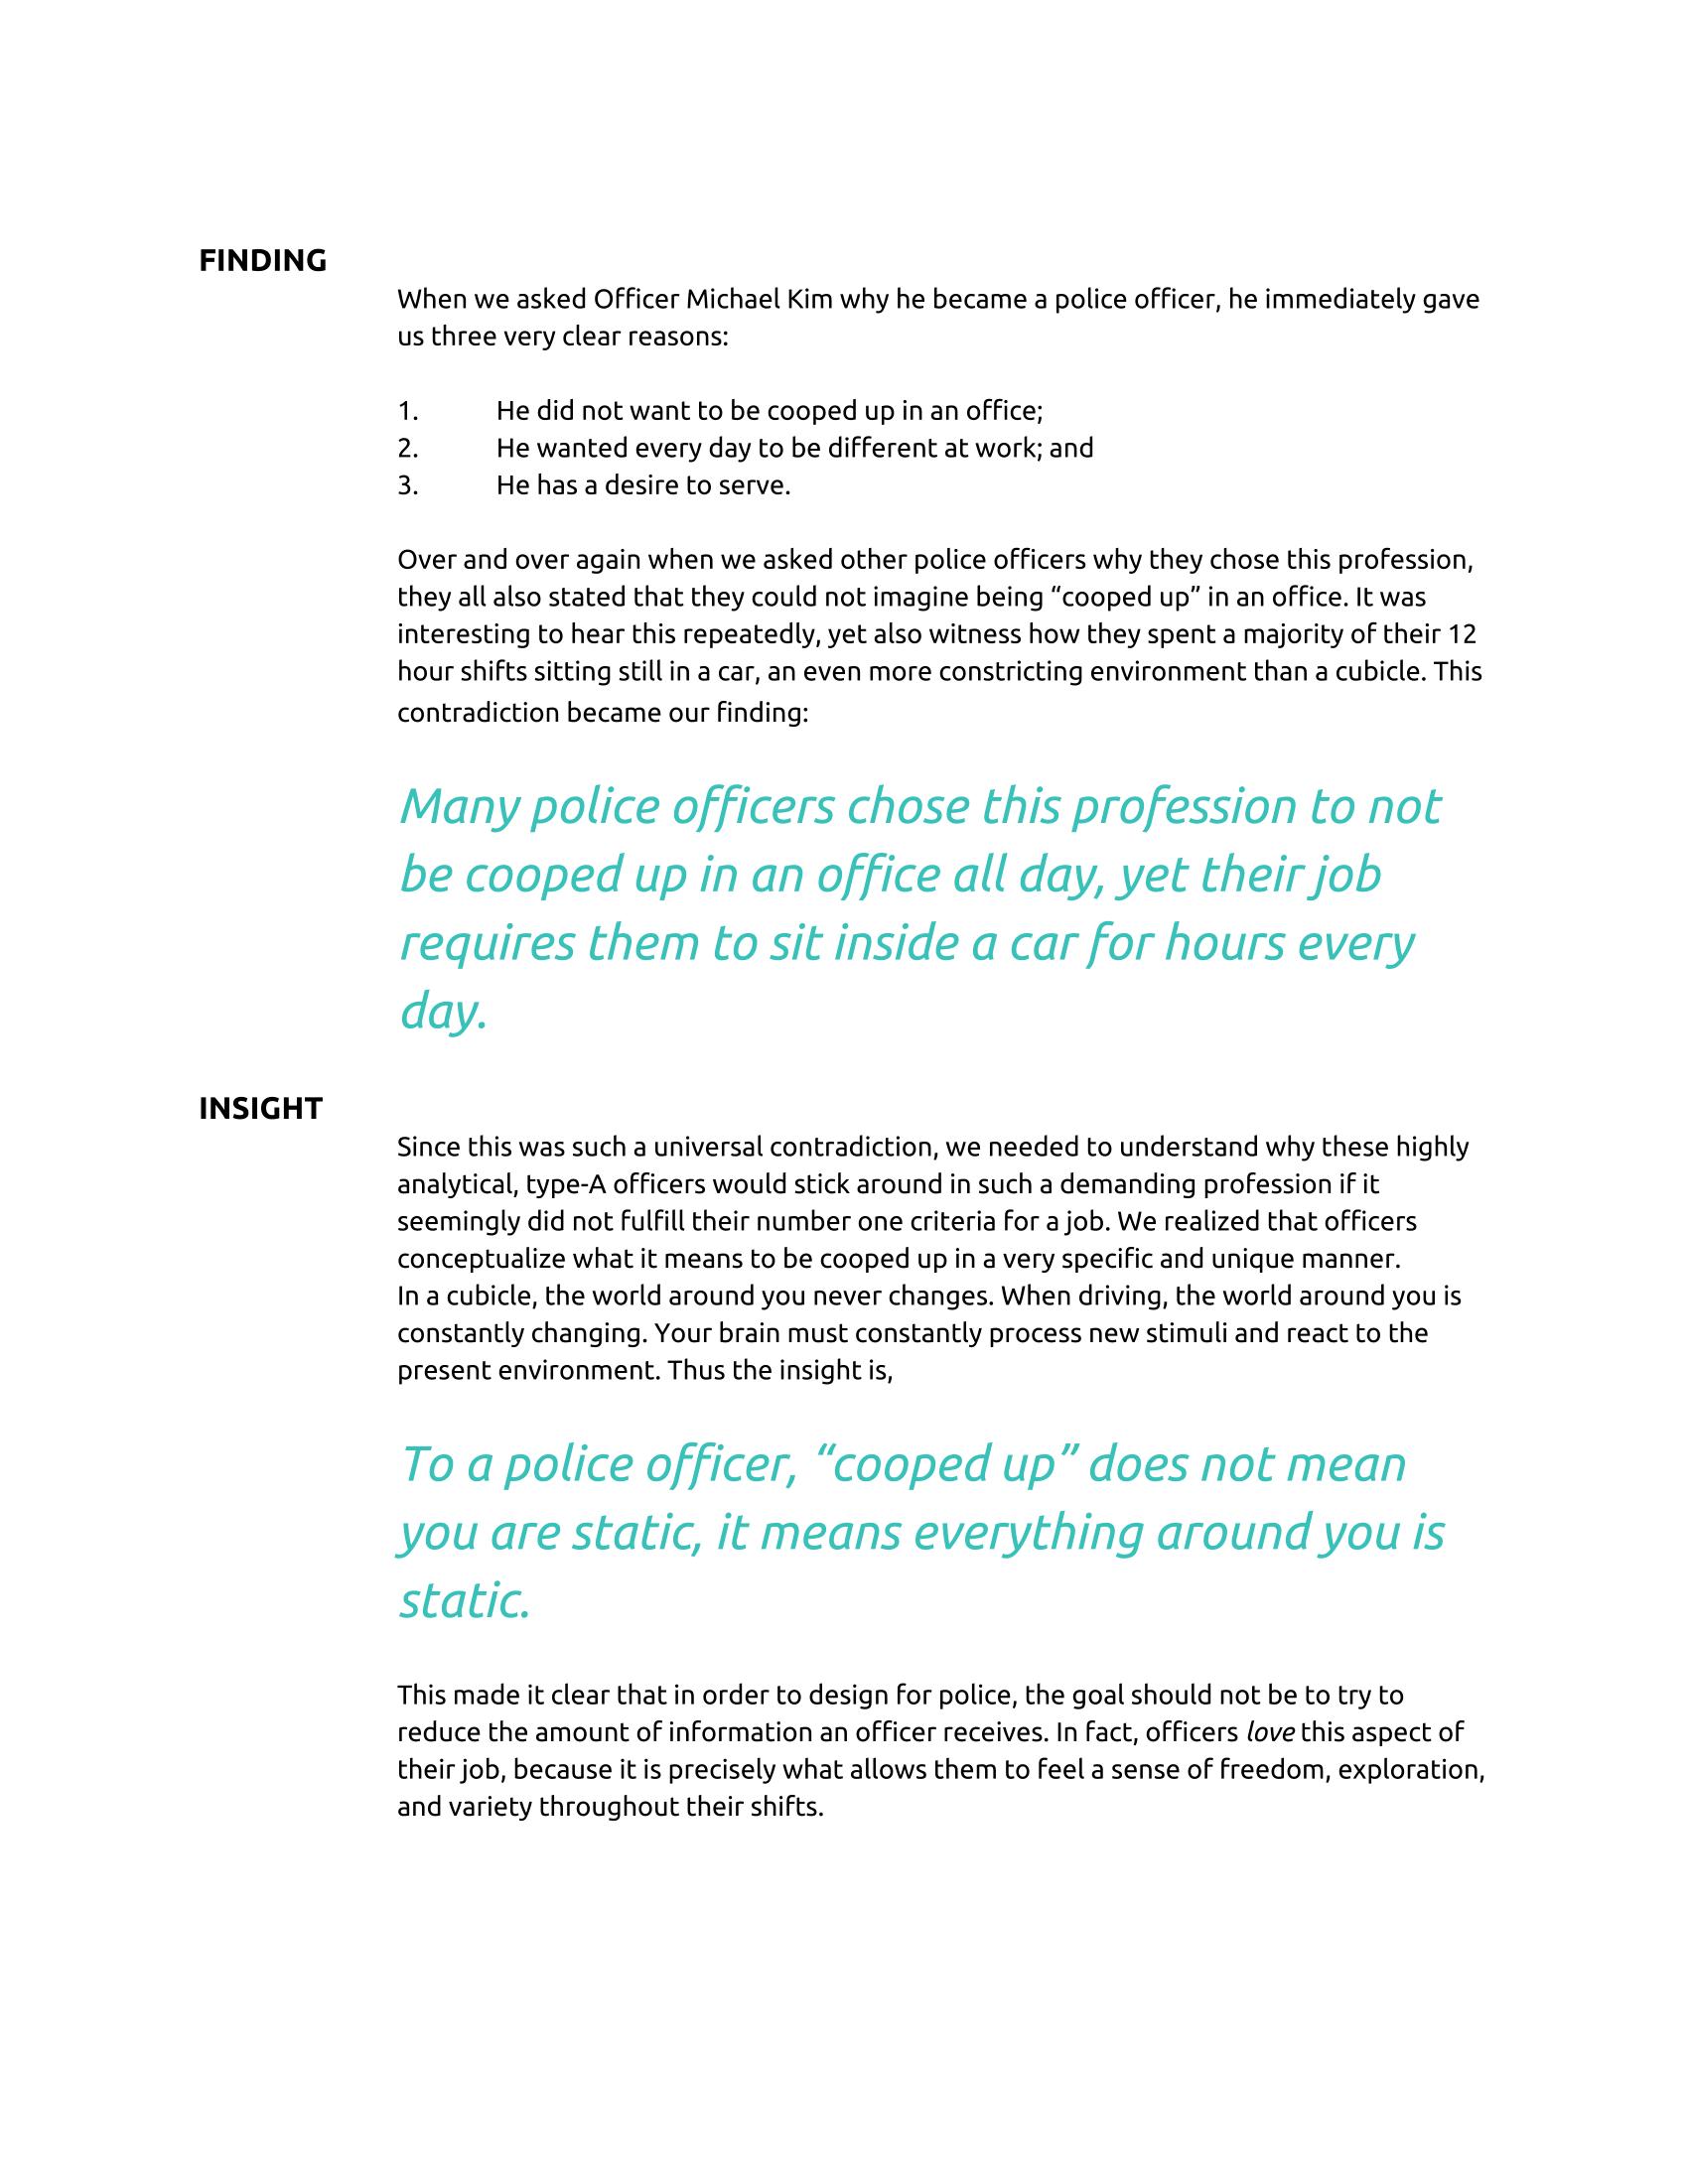 TheMercedesAdvantage (1)-2.png